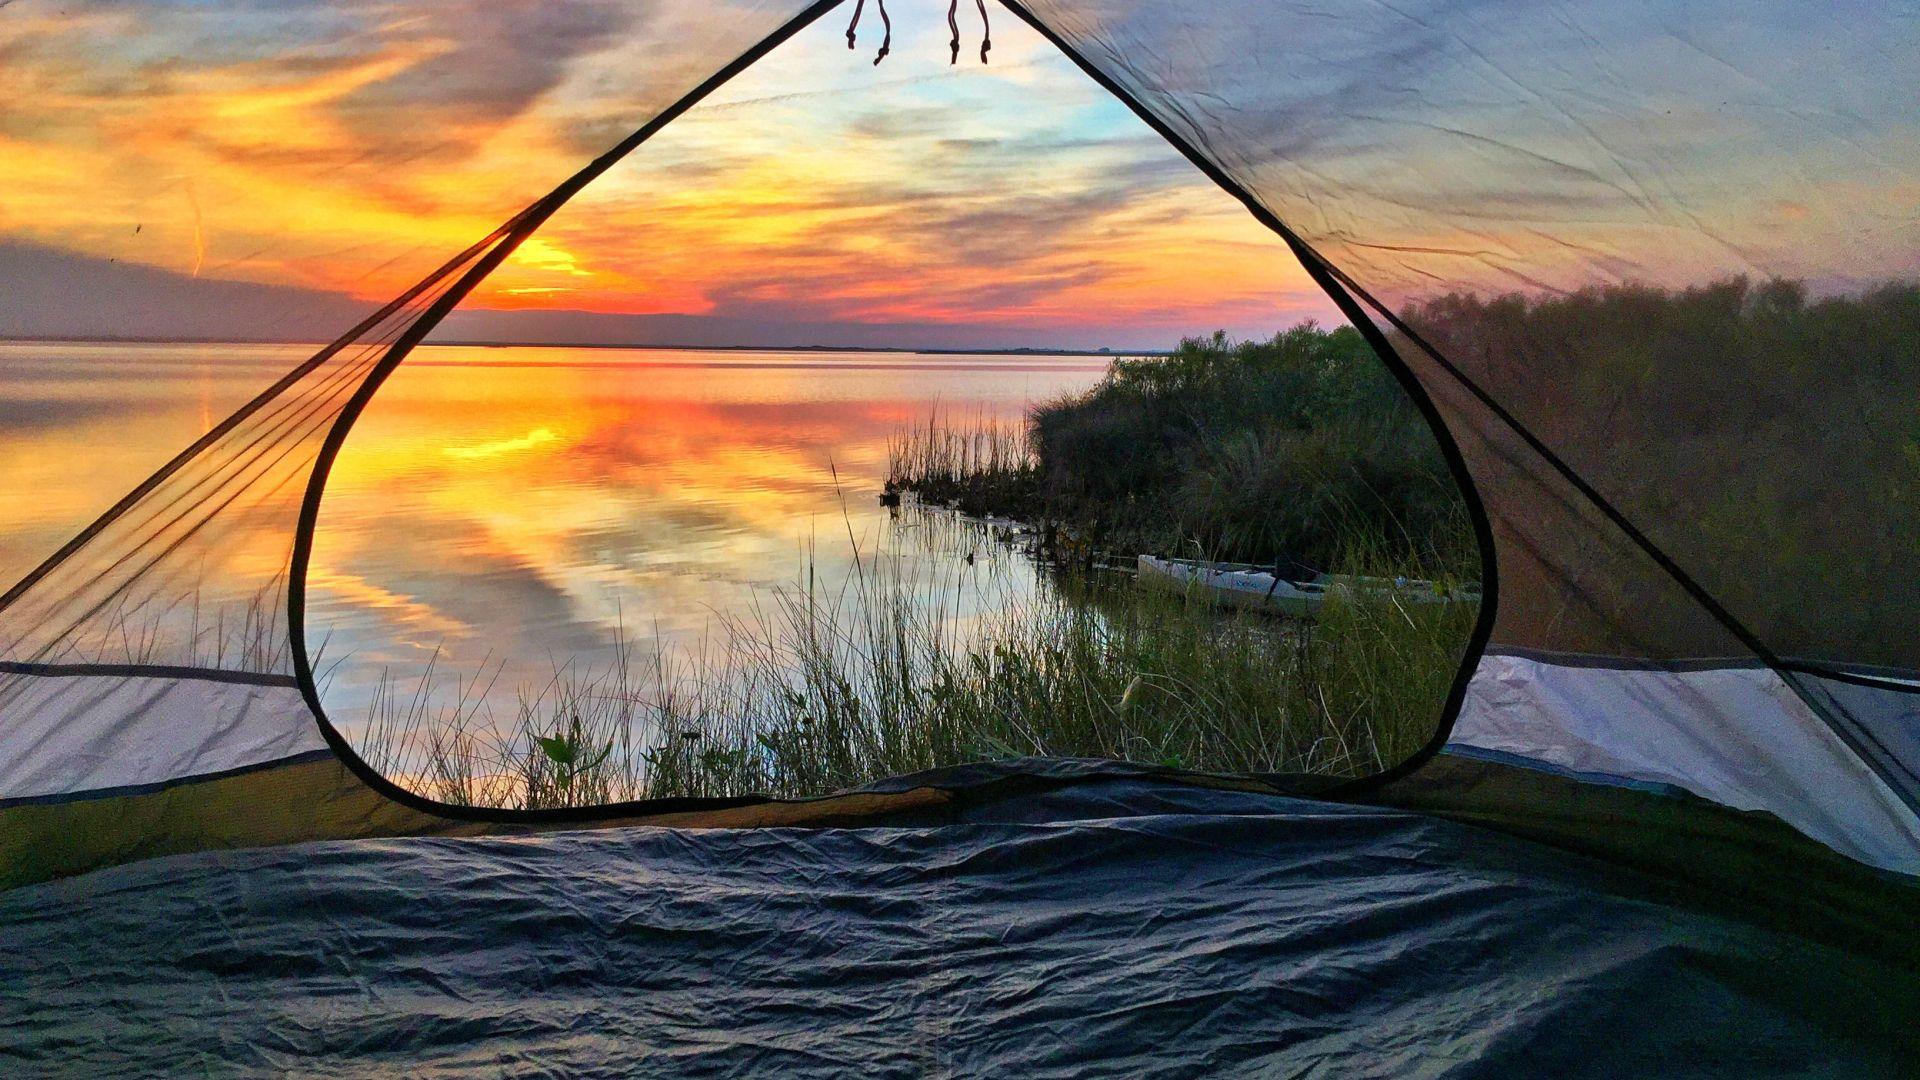 camping-wallpaper-16